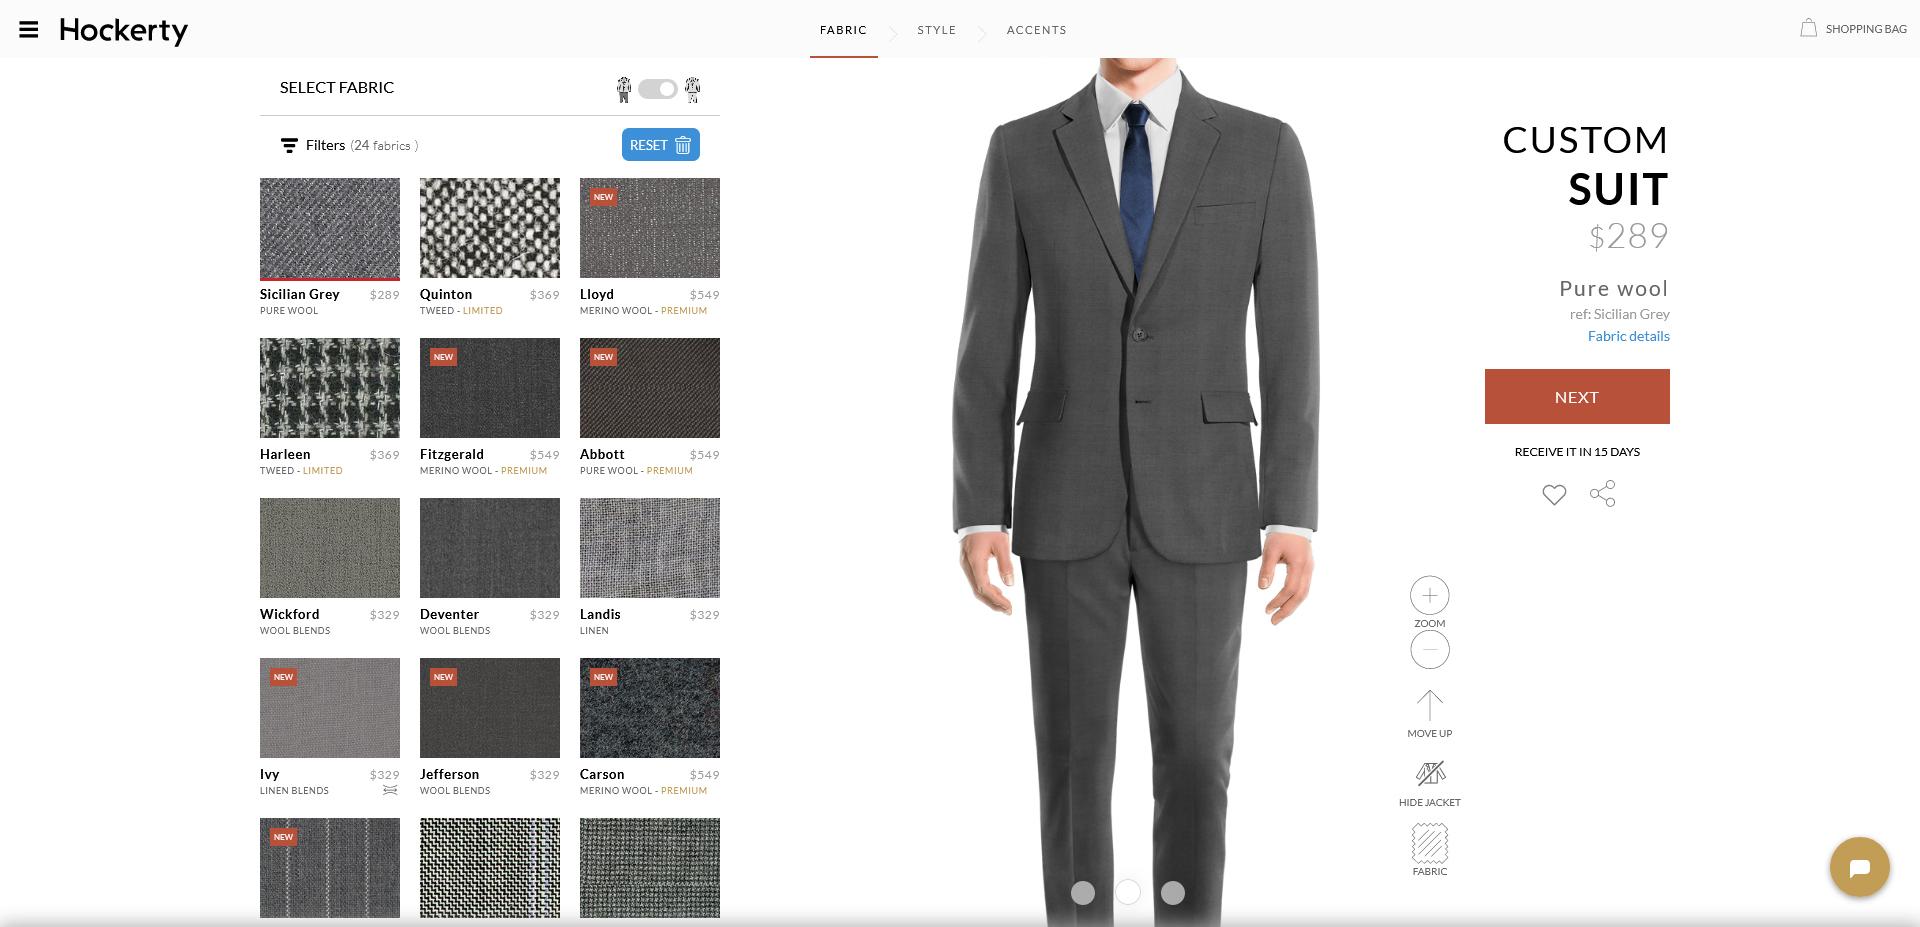 sicilian grey: medium-grey suit fabric